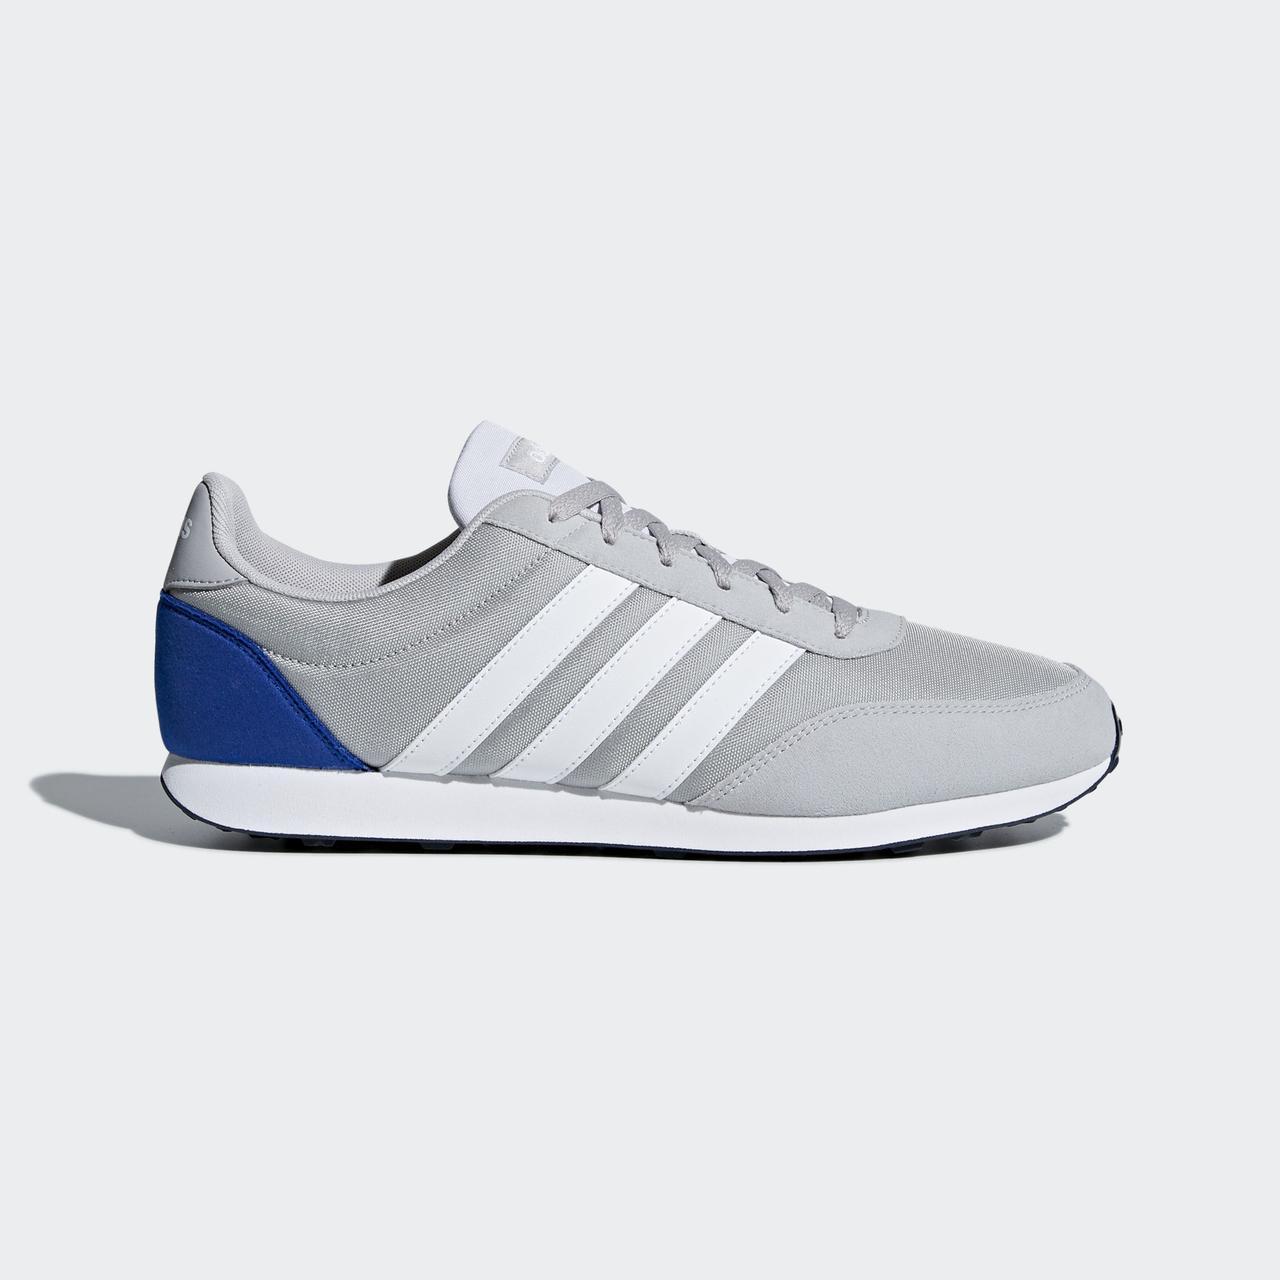 df59ffff Мужские кроссовки Adidas Neo Racer 2.0 (Артикул: DB0426) - Интернет-магазин  «